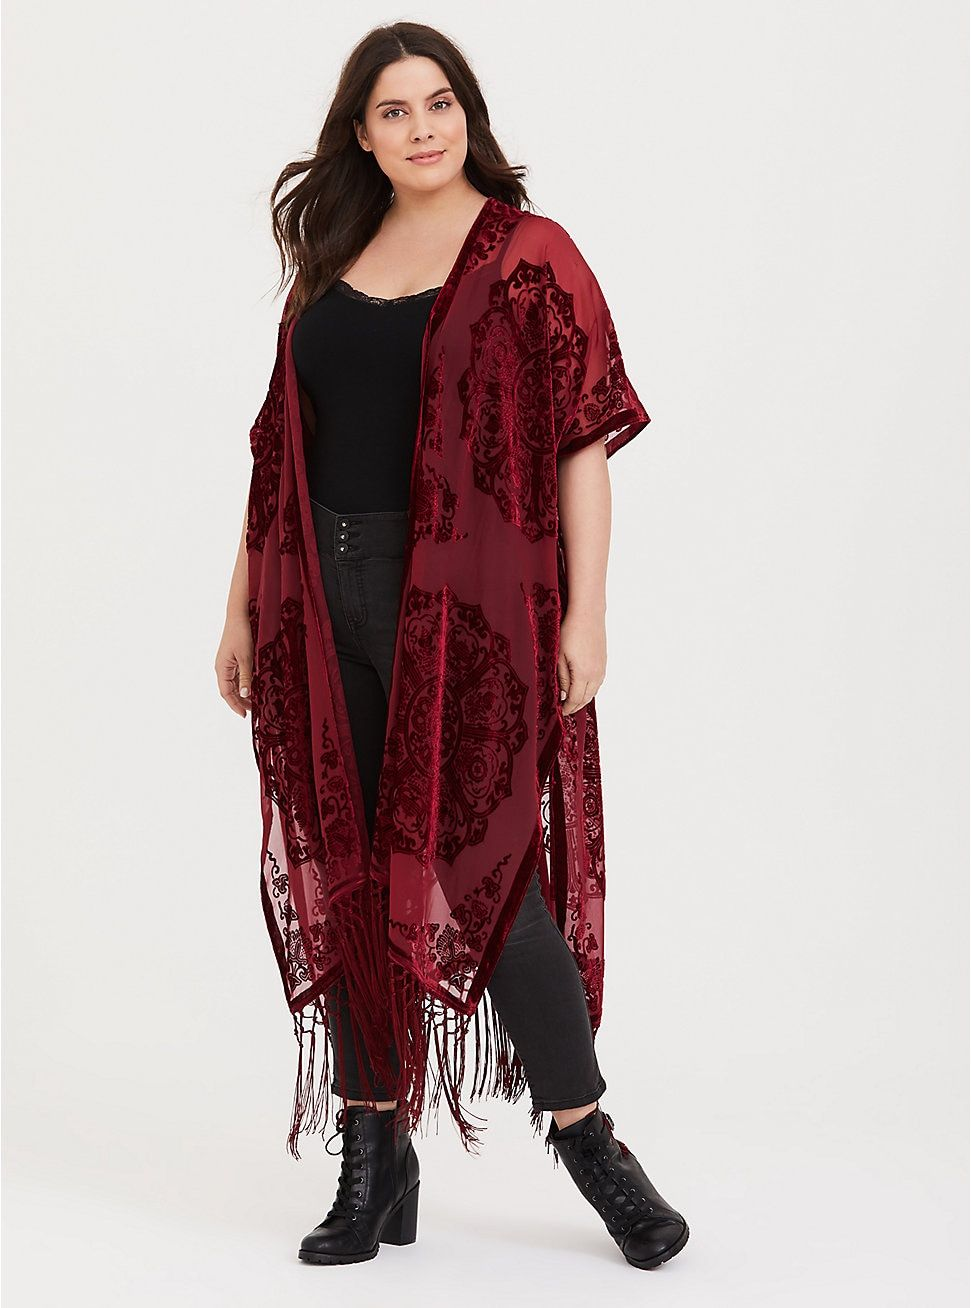 cc24f48b2 Red Burnout Velvet Chiffon Kimono in 2019   My Style   Chiffon ...